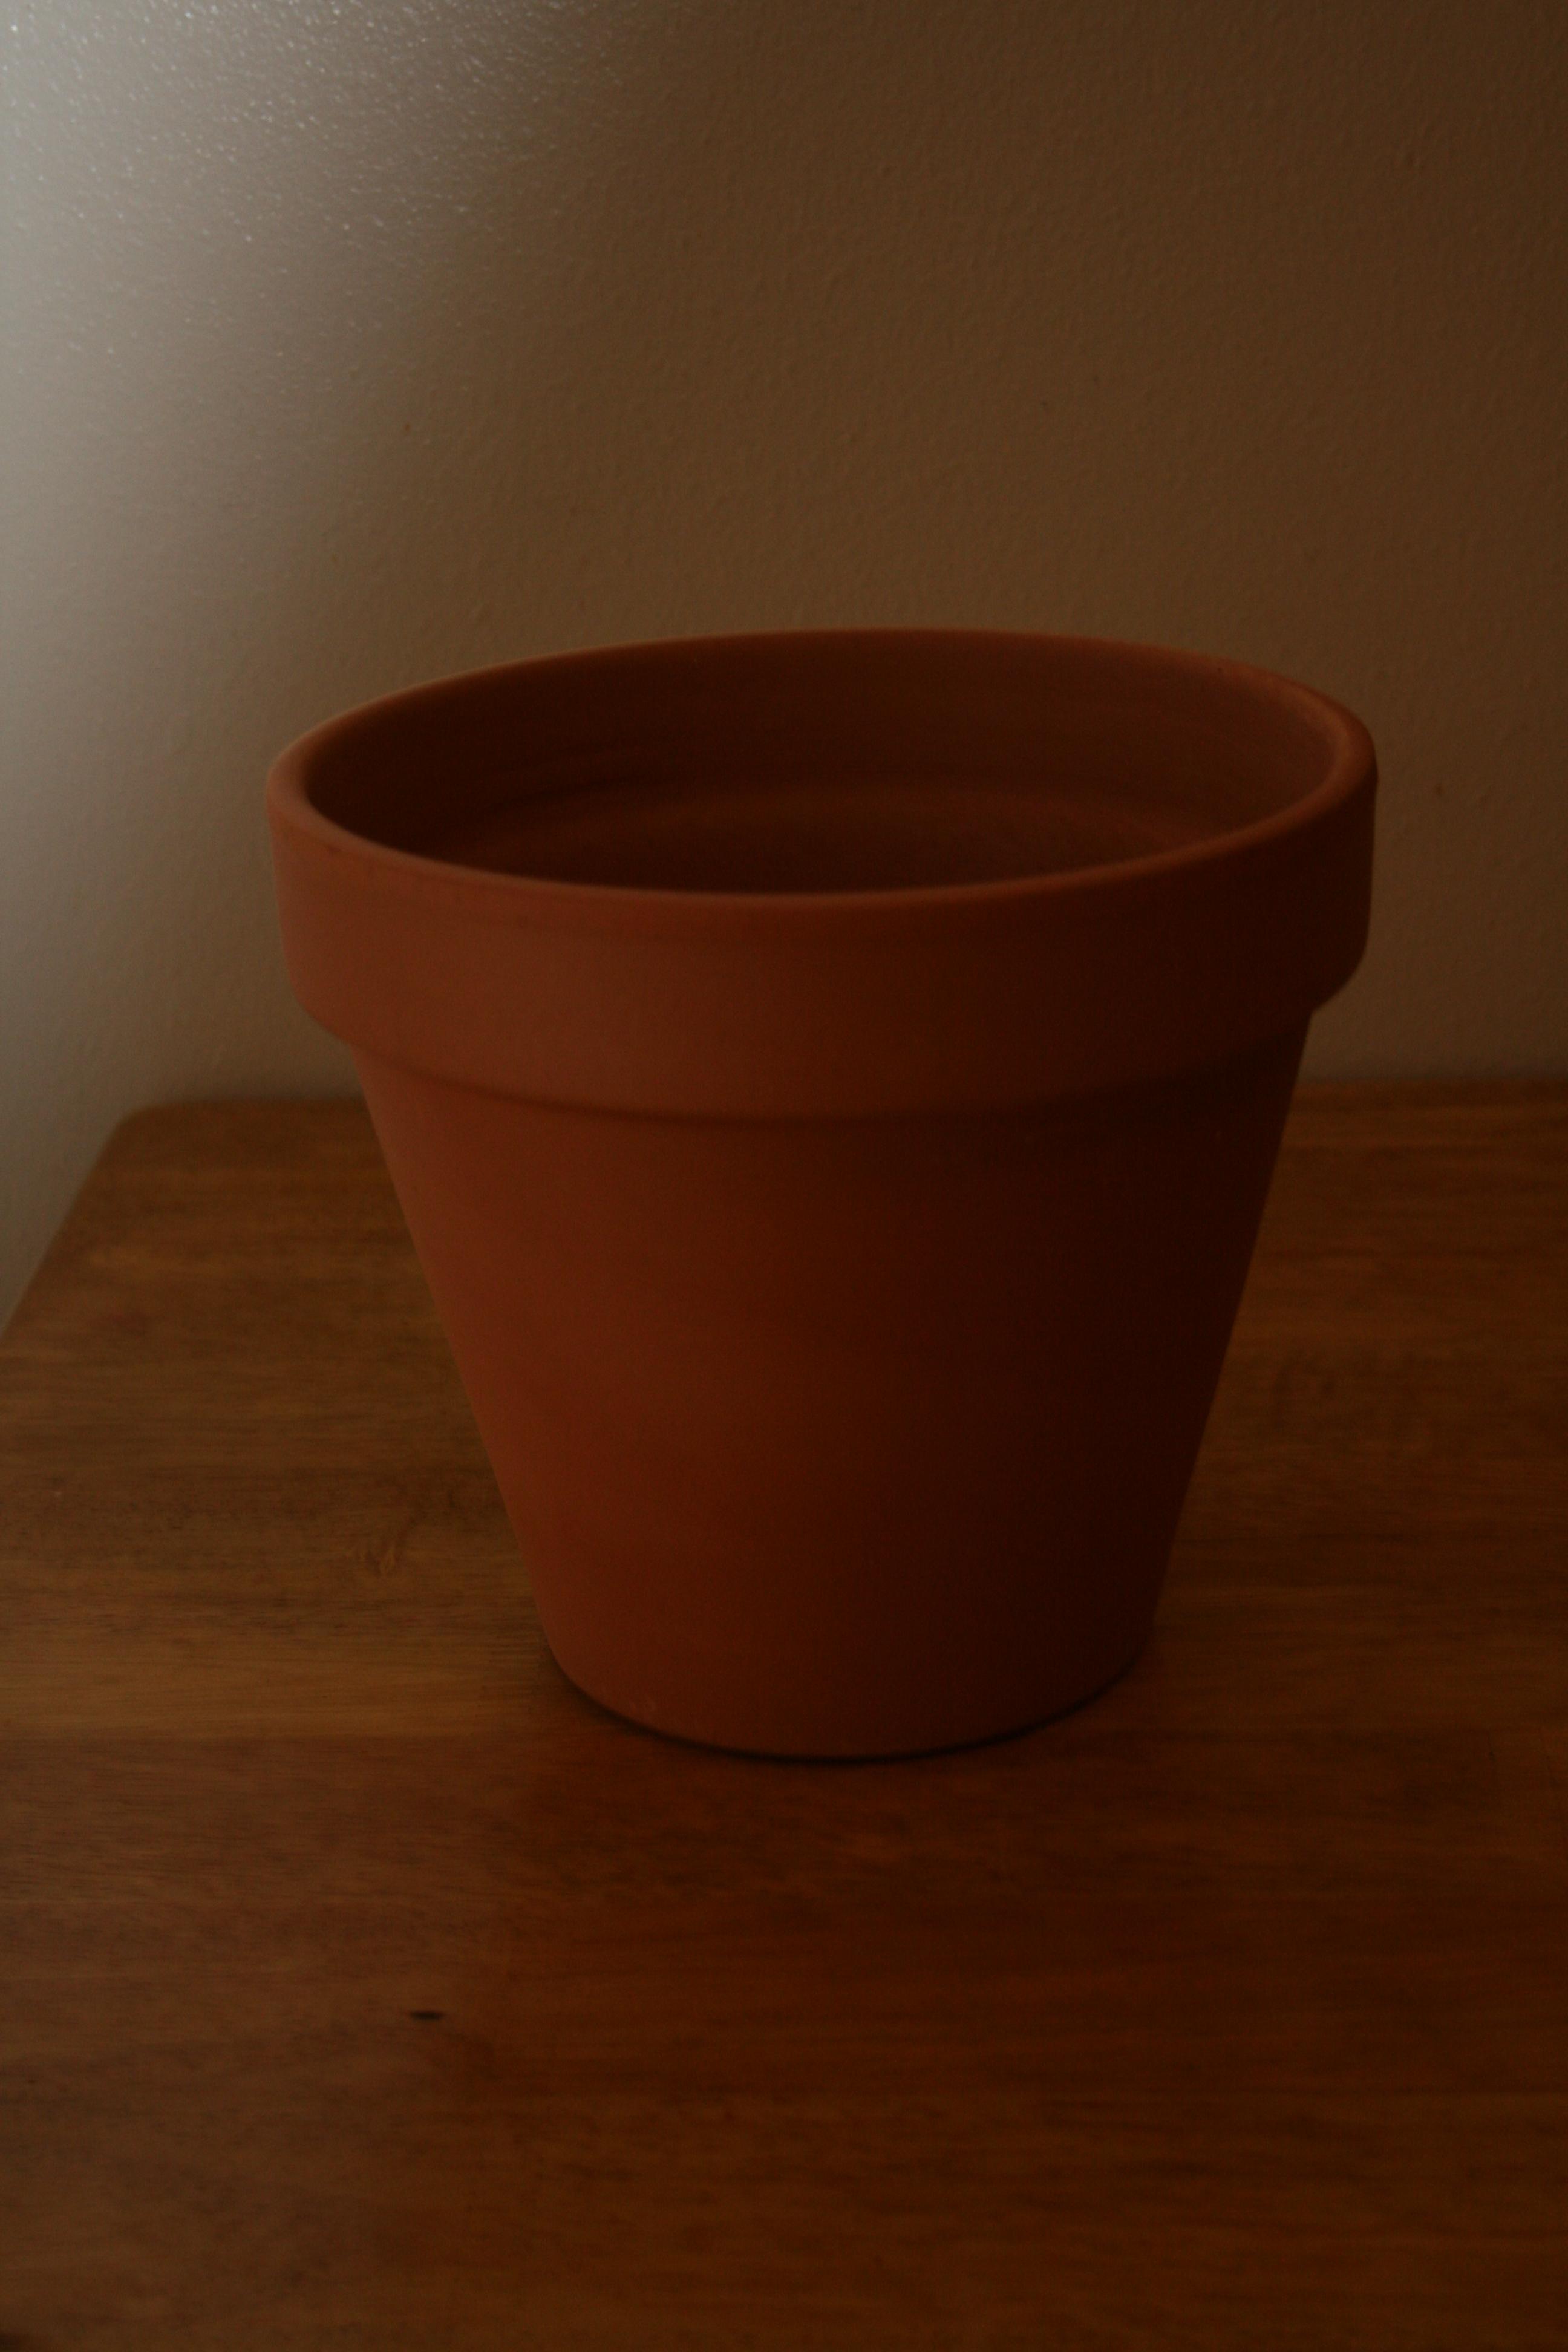 Flower Pots Cheap Home Project Cheap Home Project KidsONLV